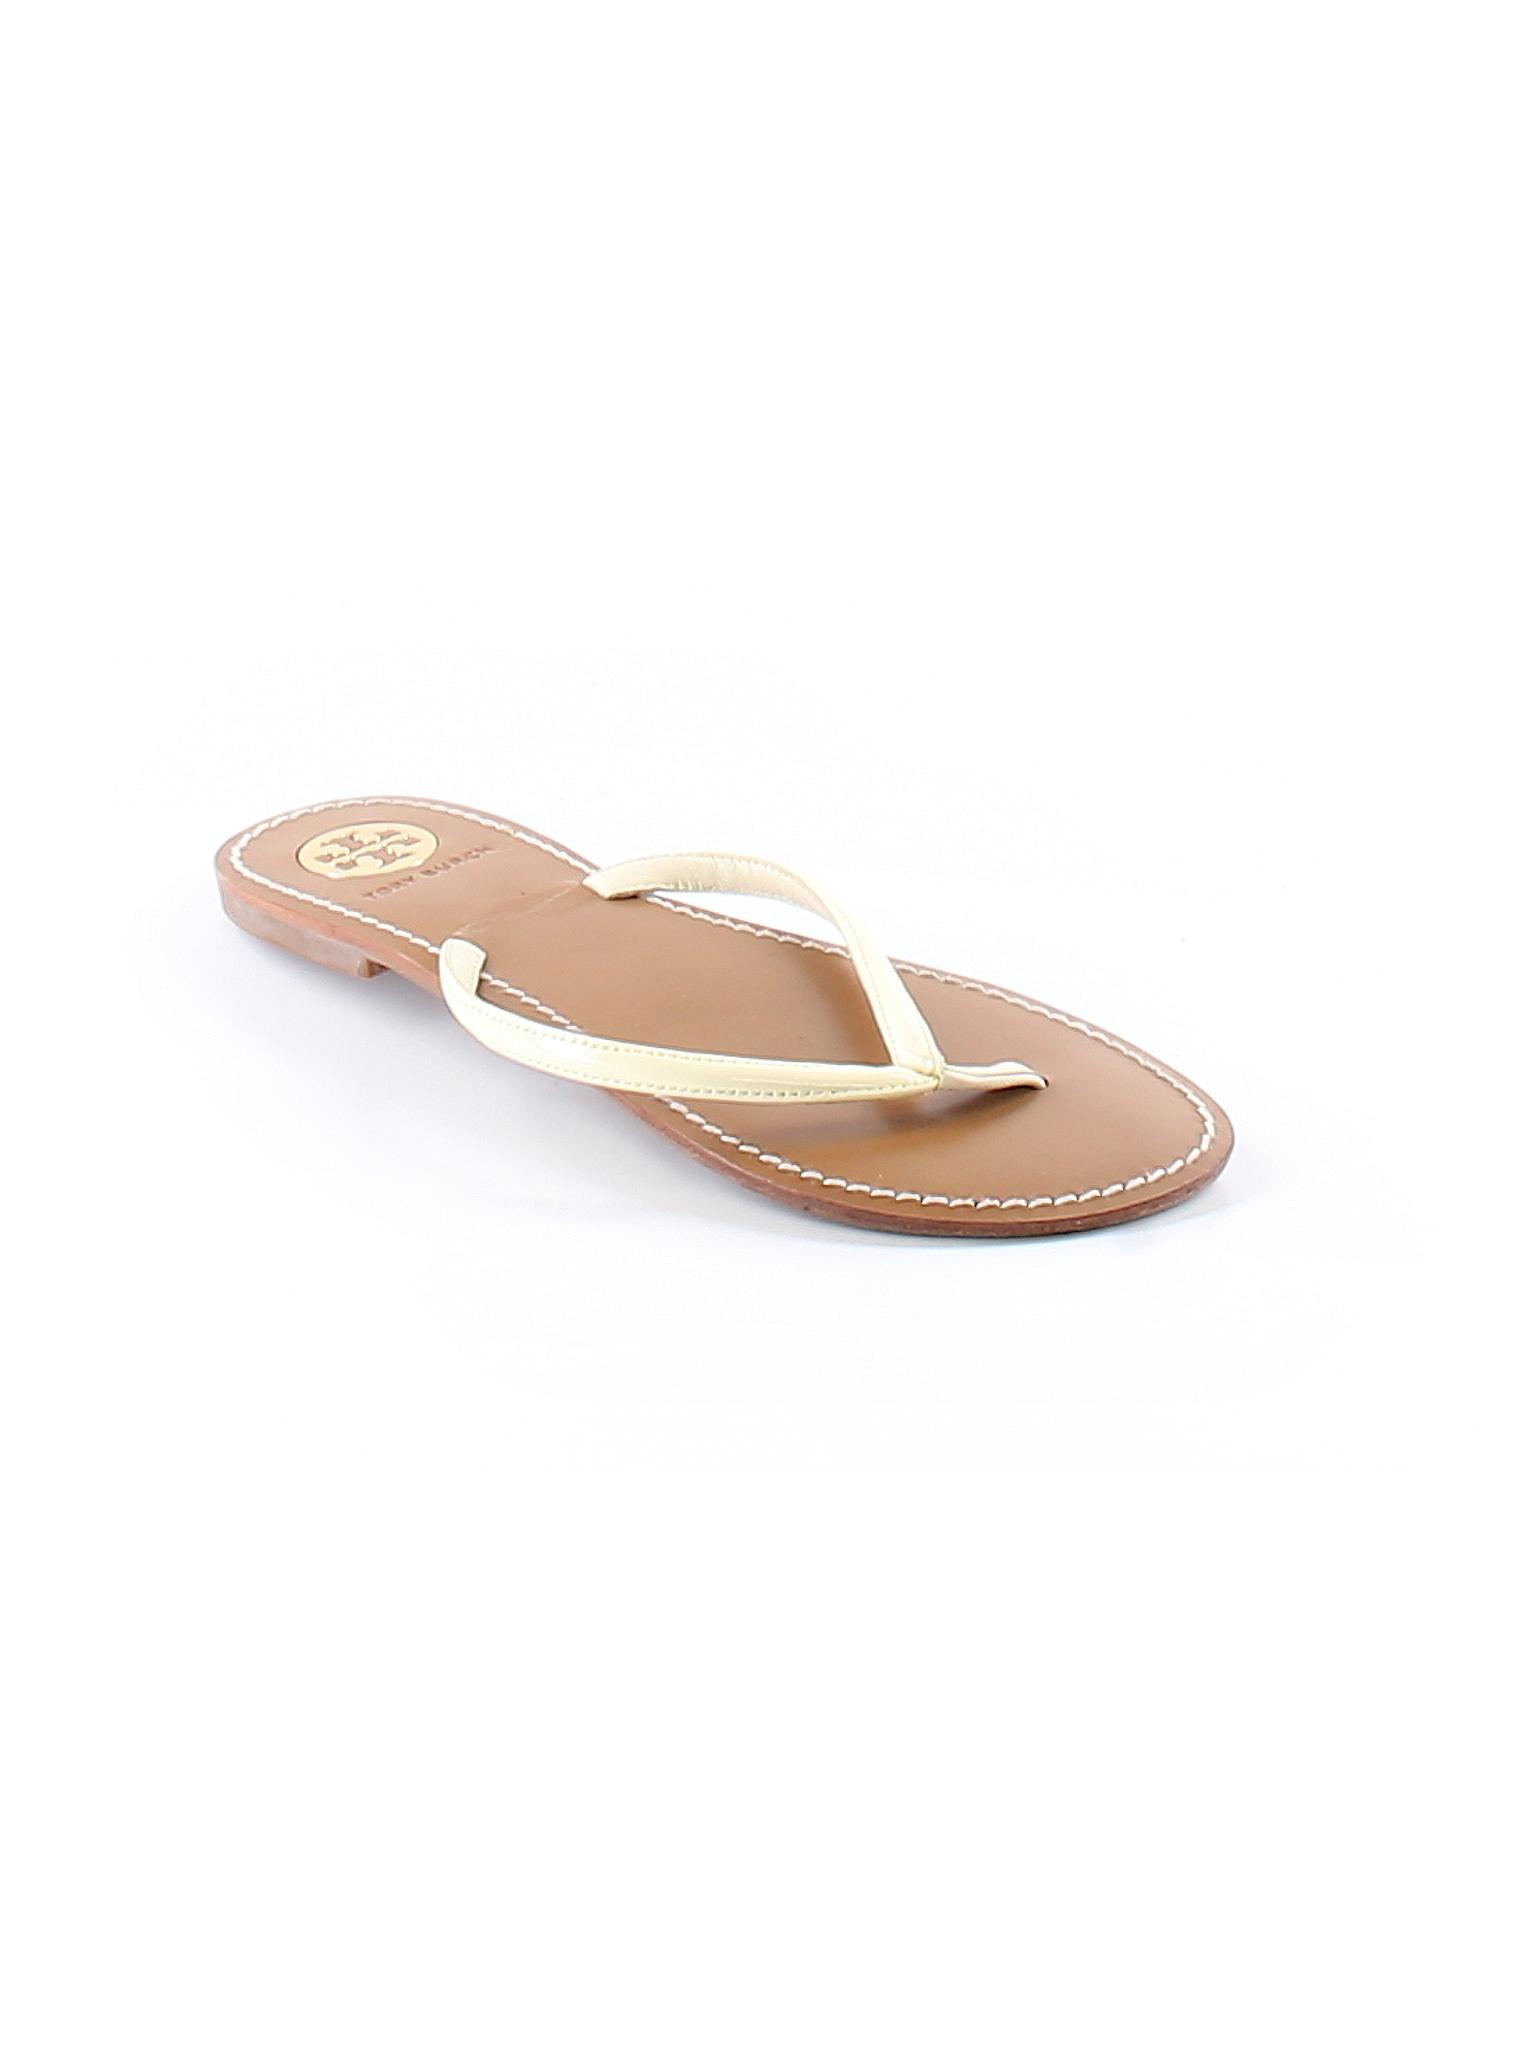 Tory Burch Solid Ivory Flip Flops Size 7 - 68 Off  Thredup-3607